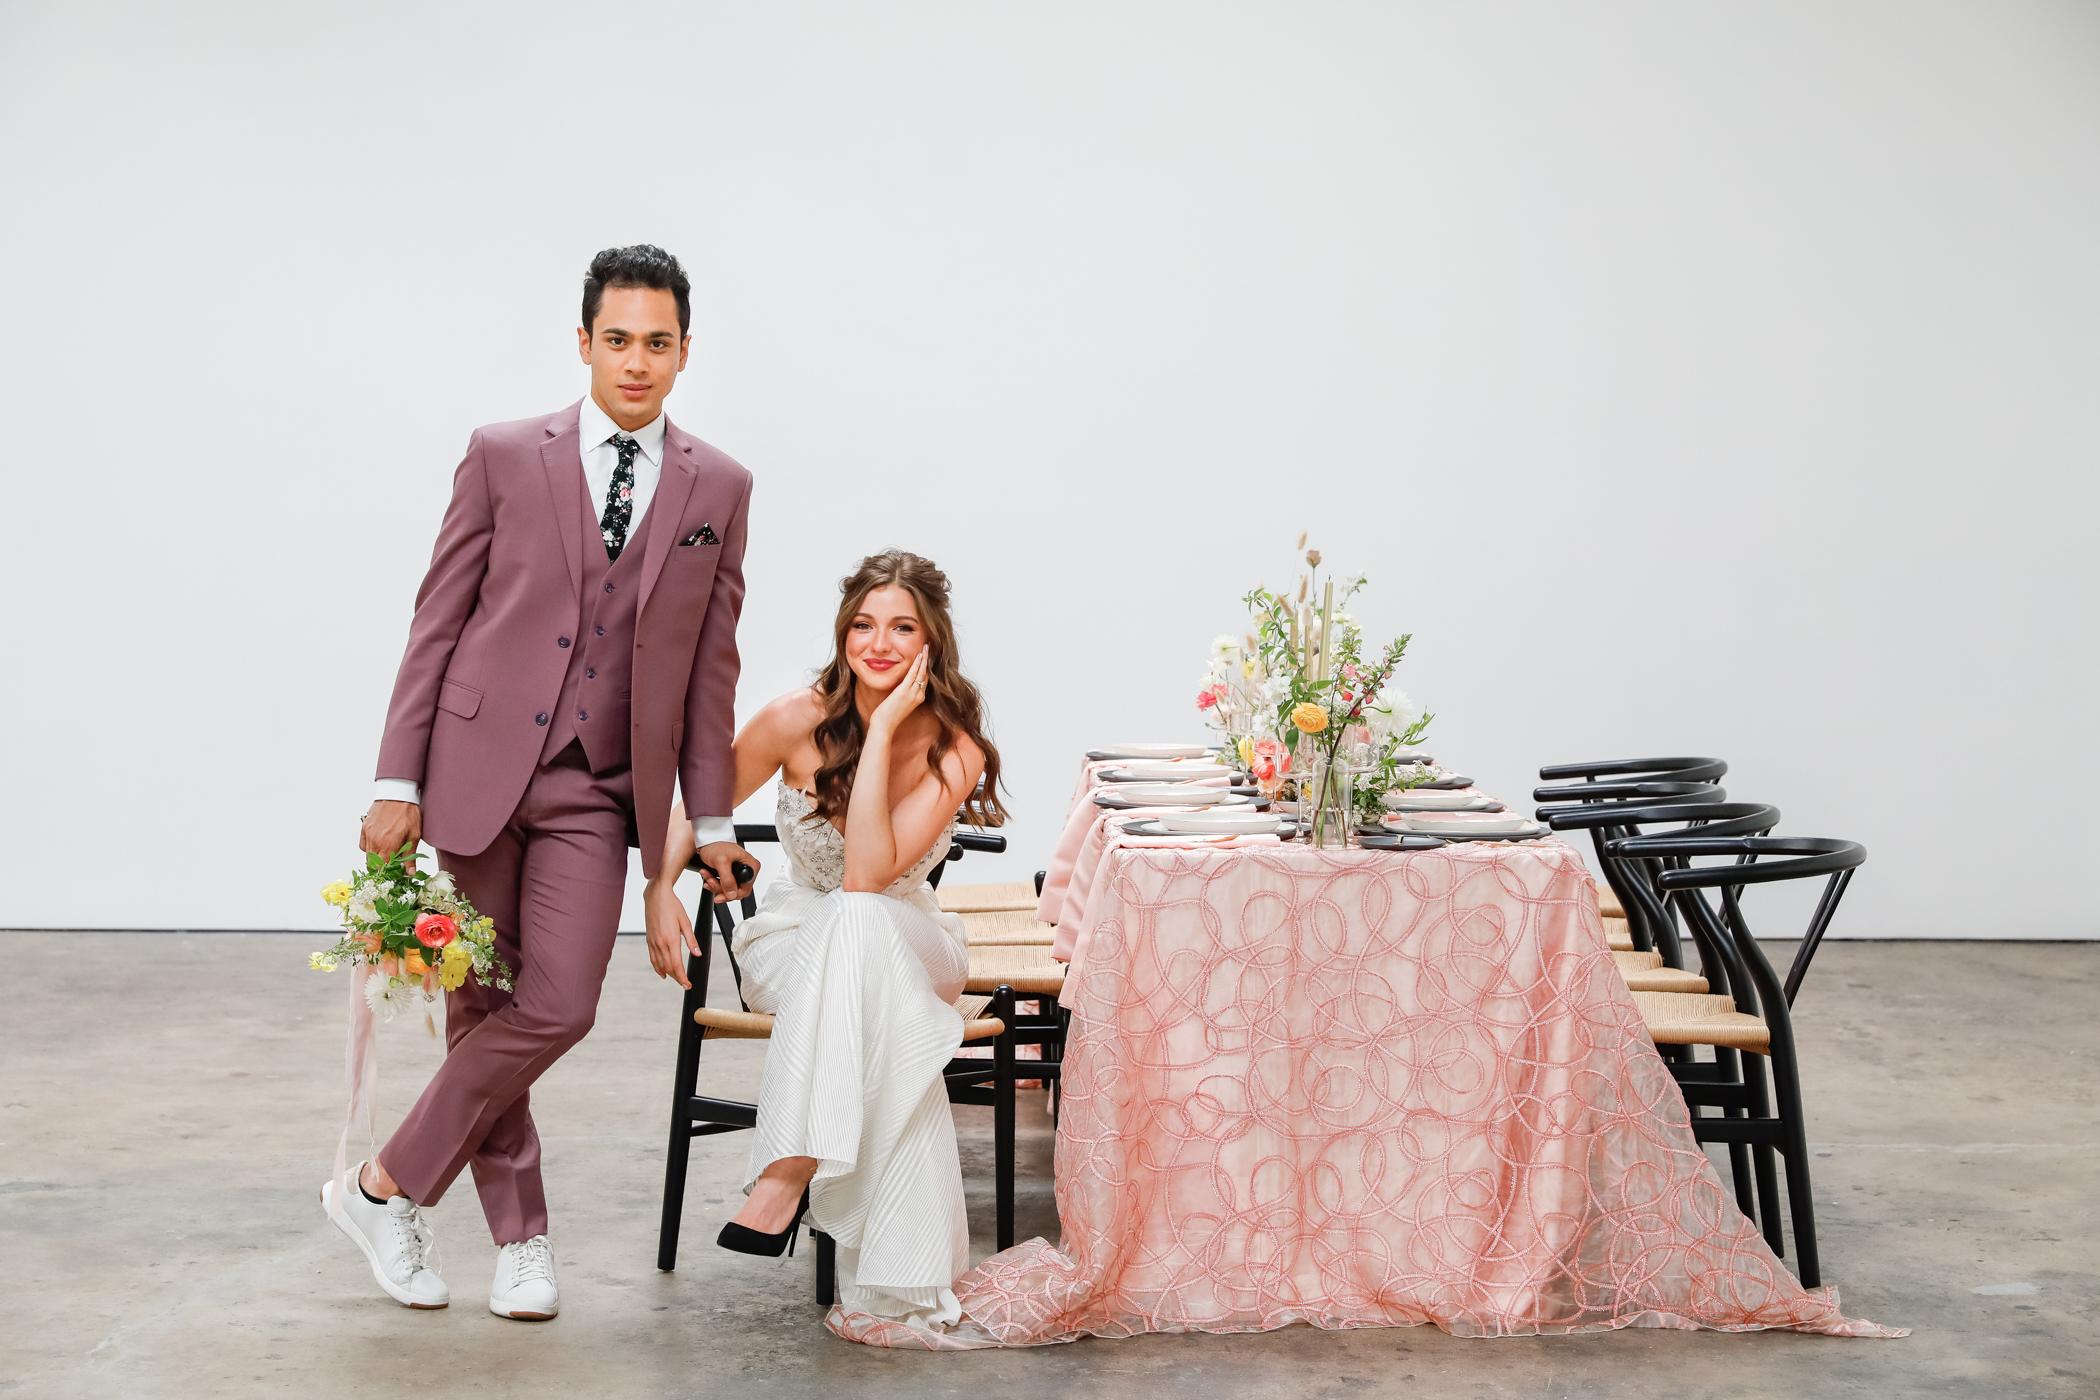 Clean and modern wedding